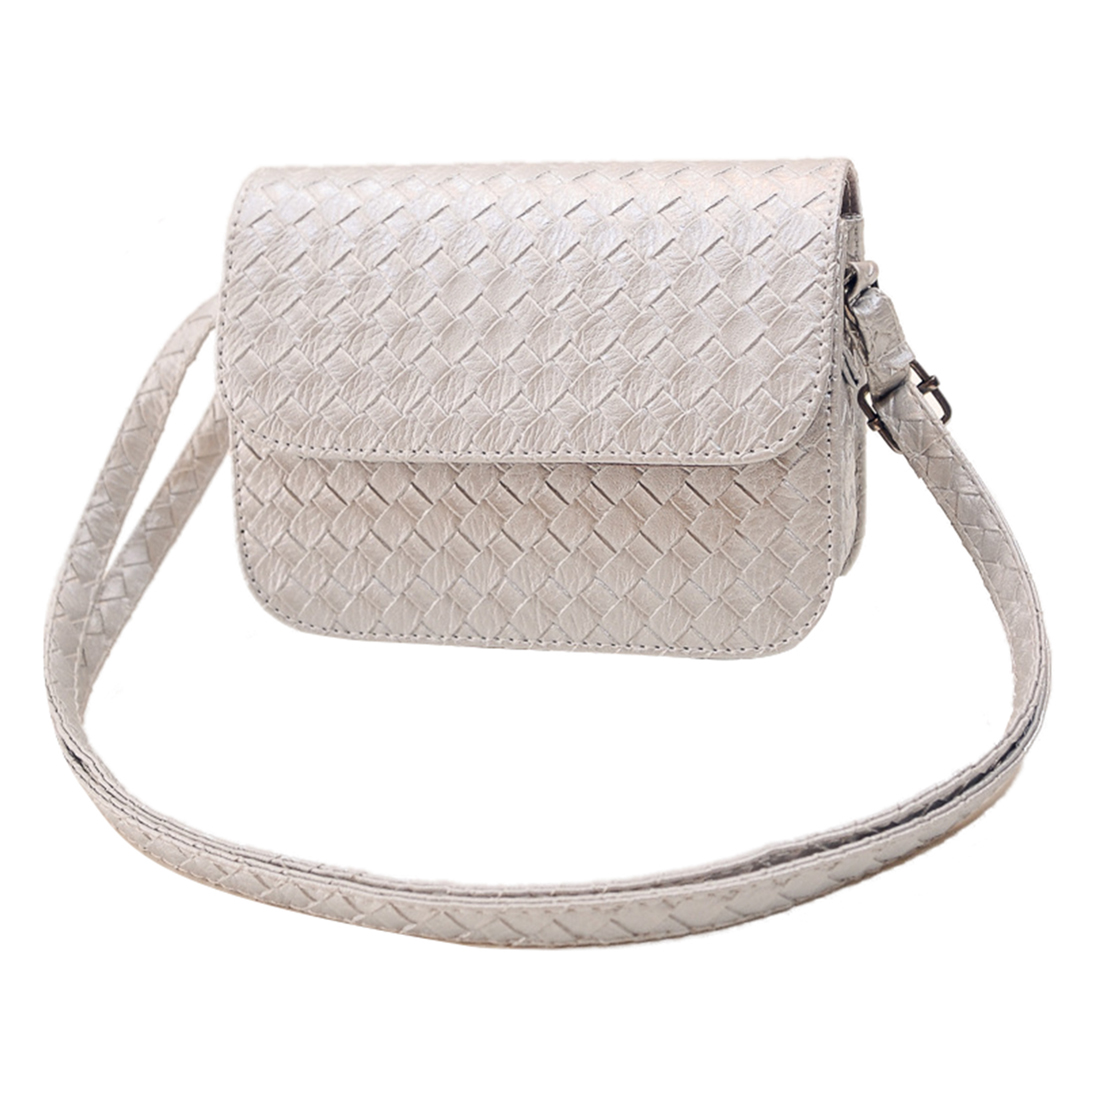 New women's PU Leather Handbag Shoulder Bag Clutch Tote Purse Messenger(Silver) new womens shoulder leather bag clutch handbag tote purse hobo messenger bag popular